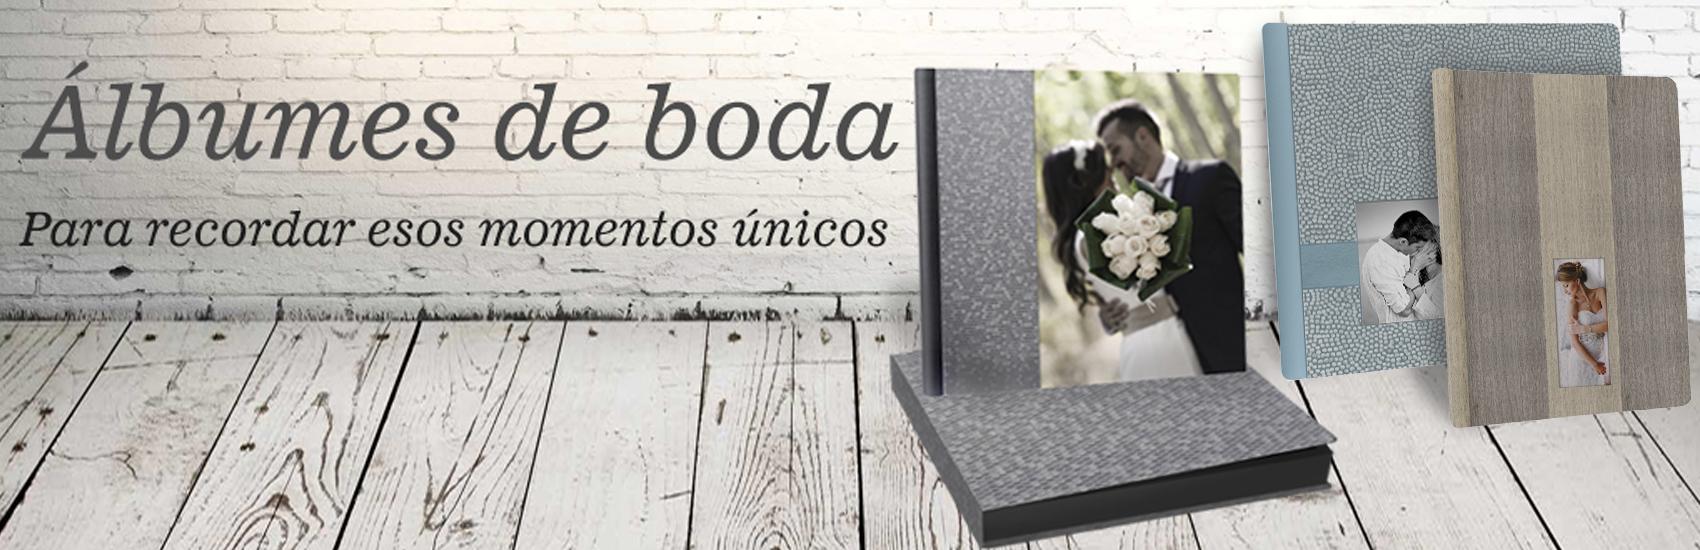 albumes boda imprefoto slide